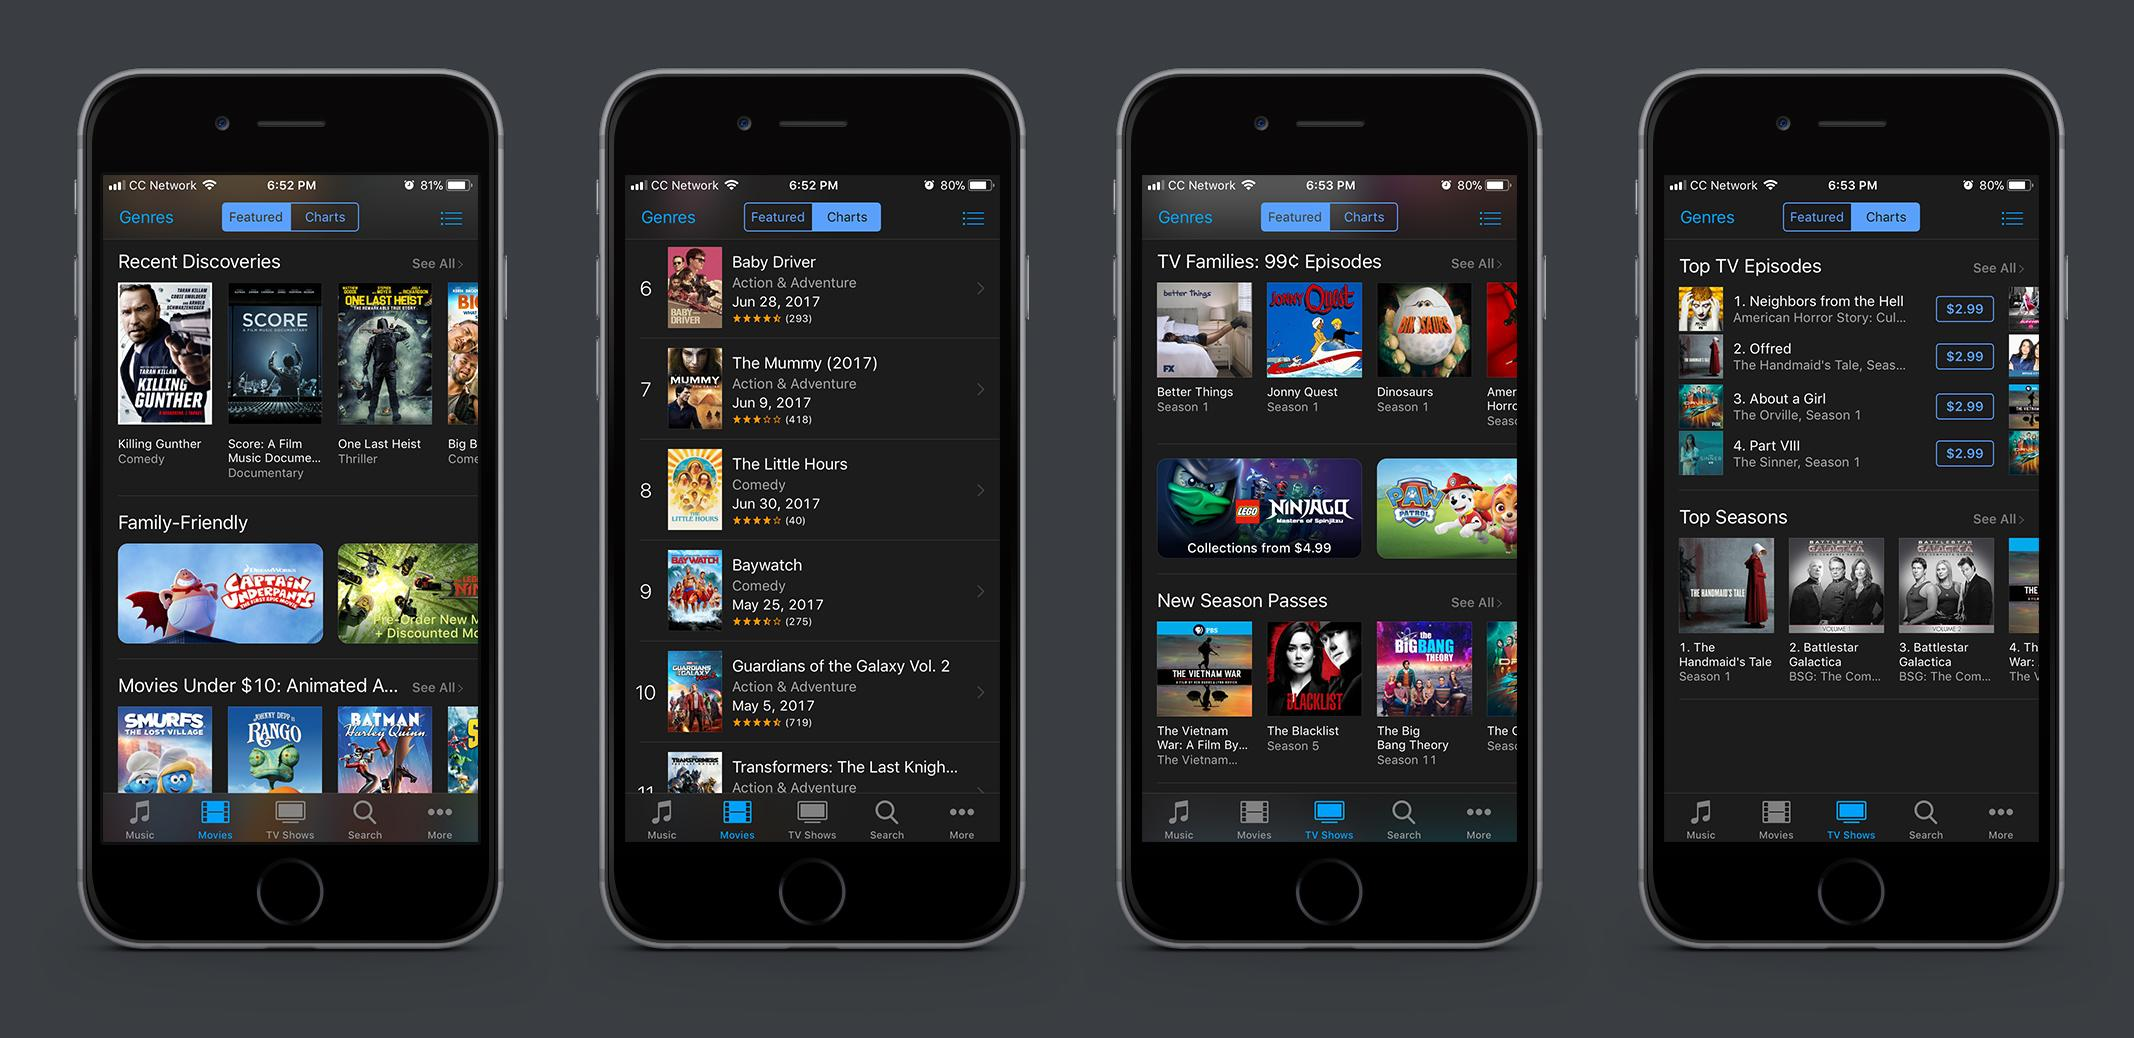 Diseño de UI oscuro para Apple